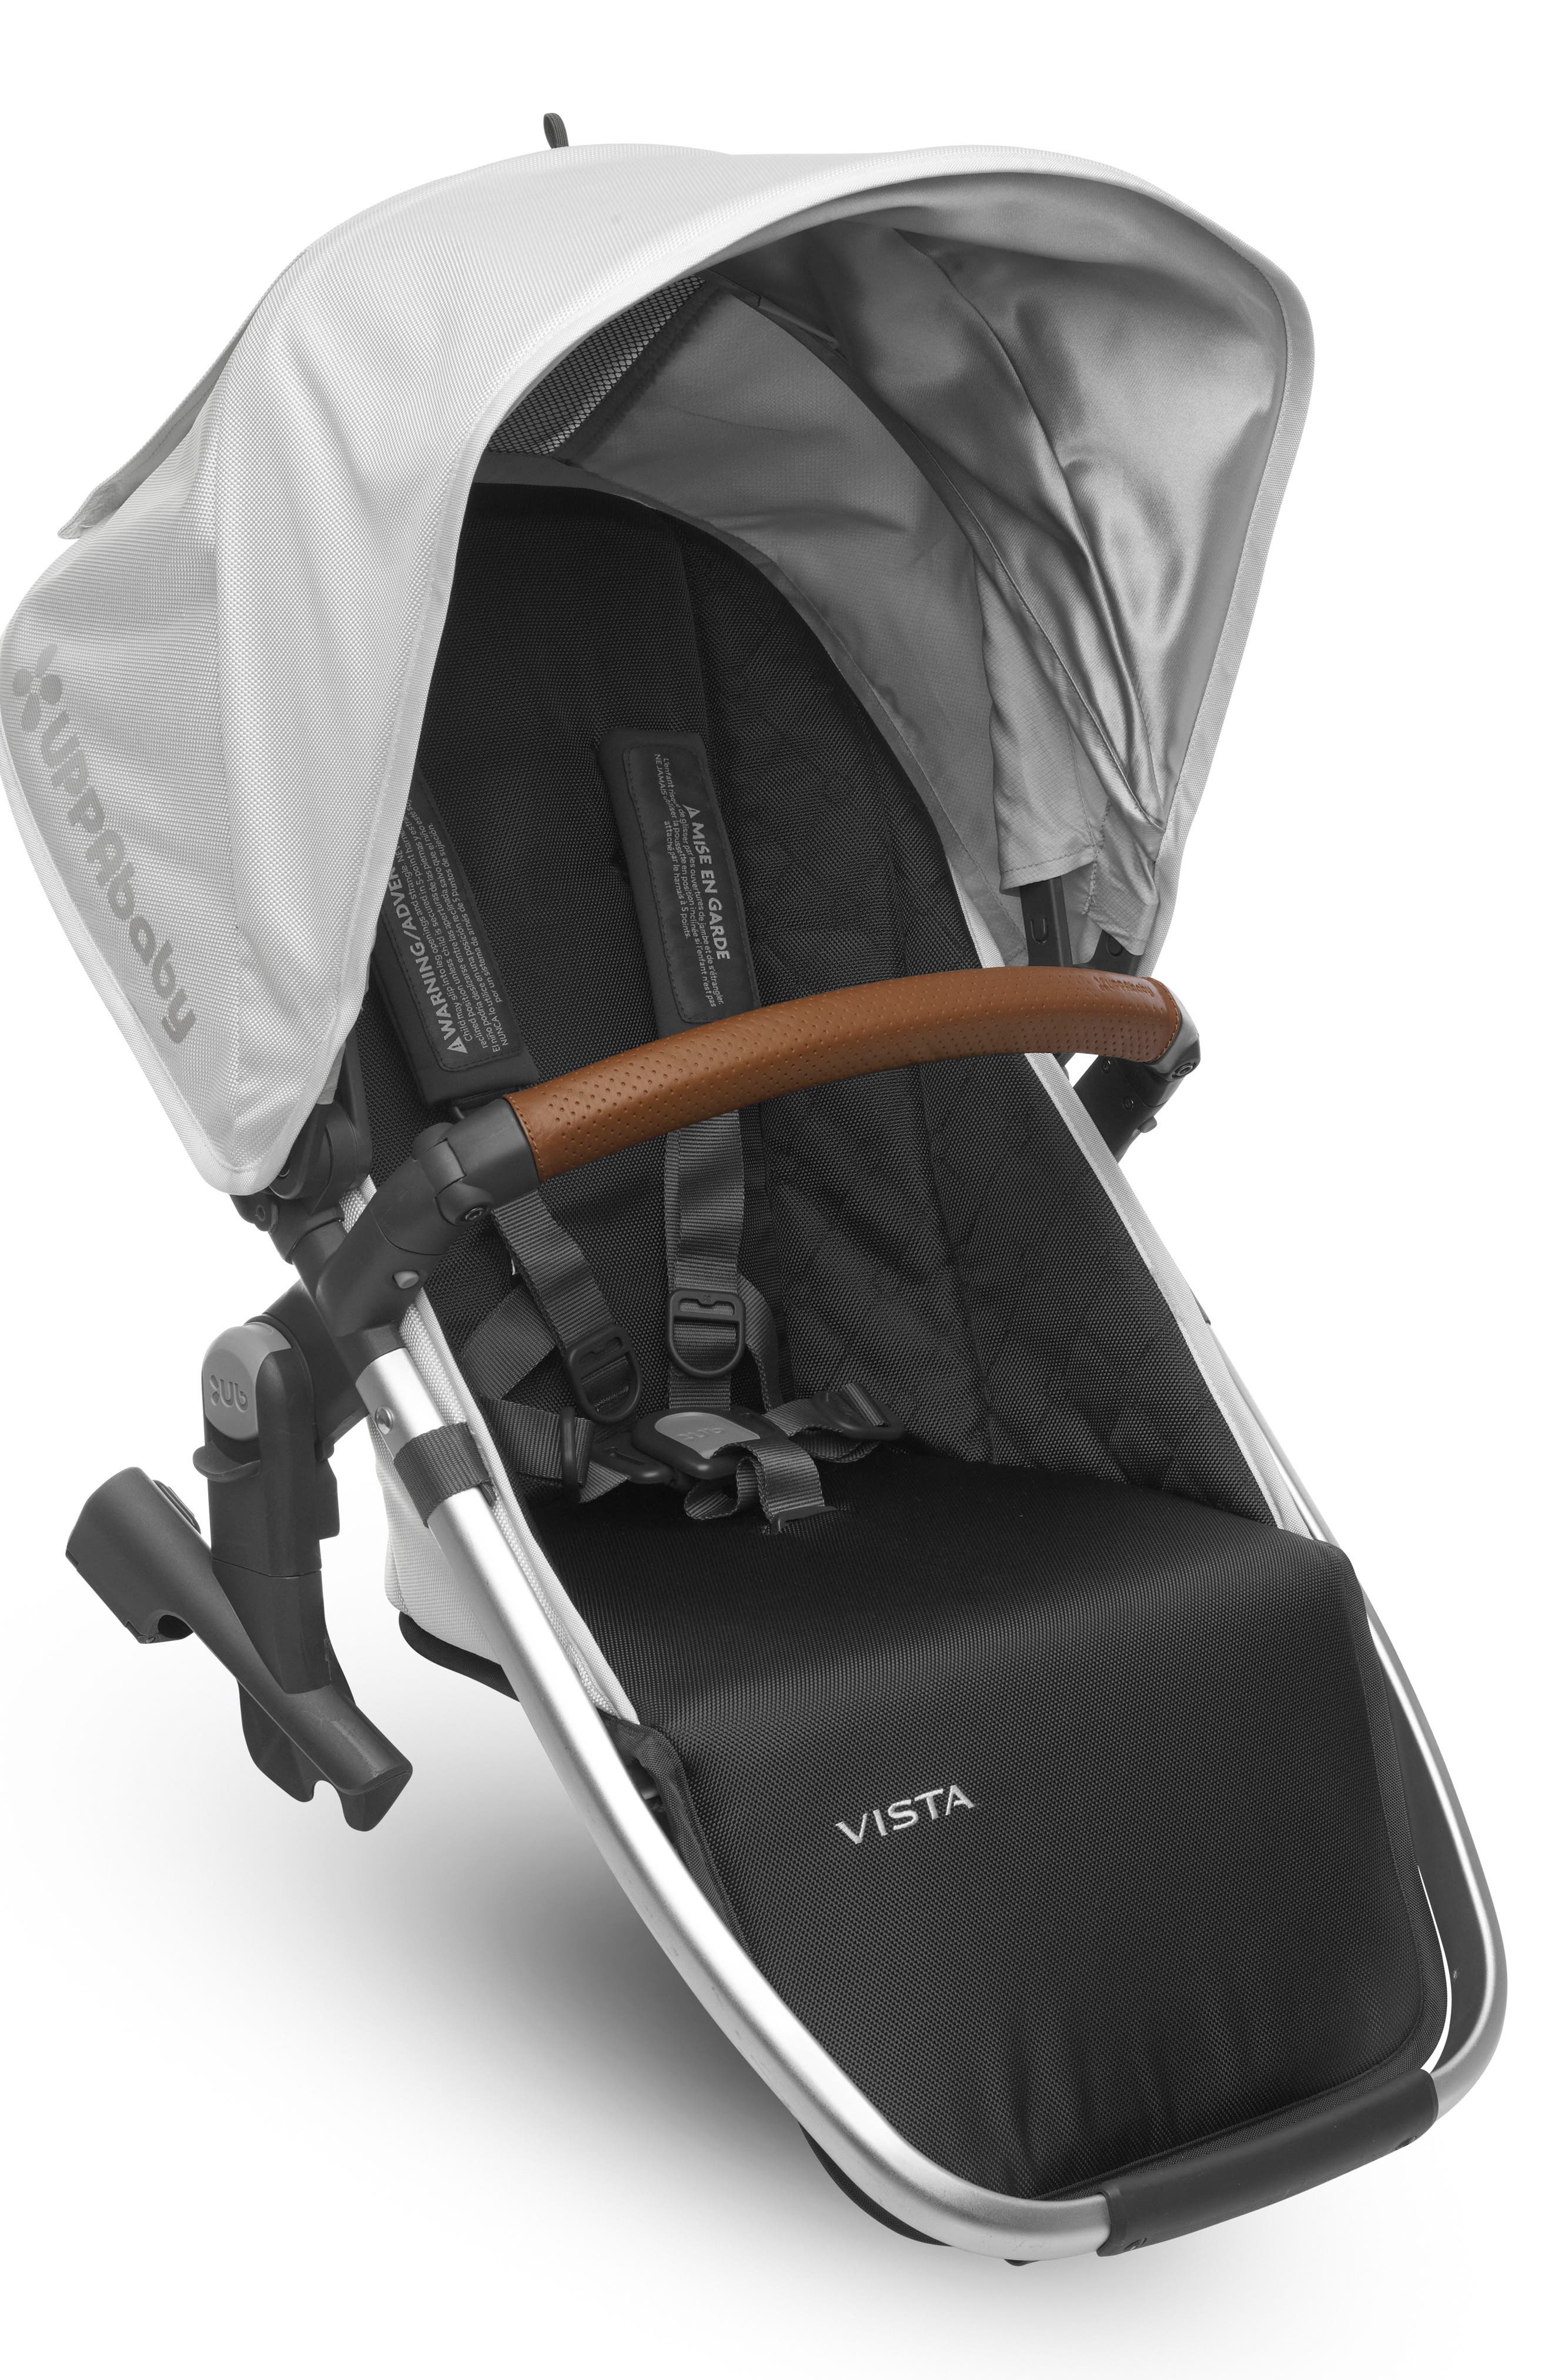 VISTA Stroller Rumble Seat,                             Main thumbnail 1, color,                             110